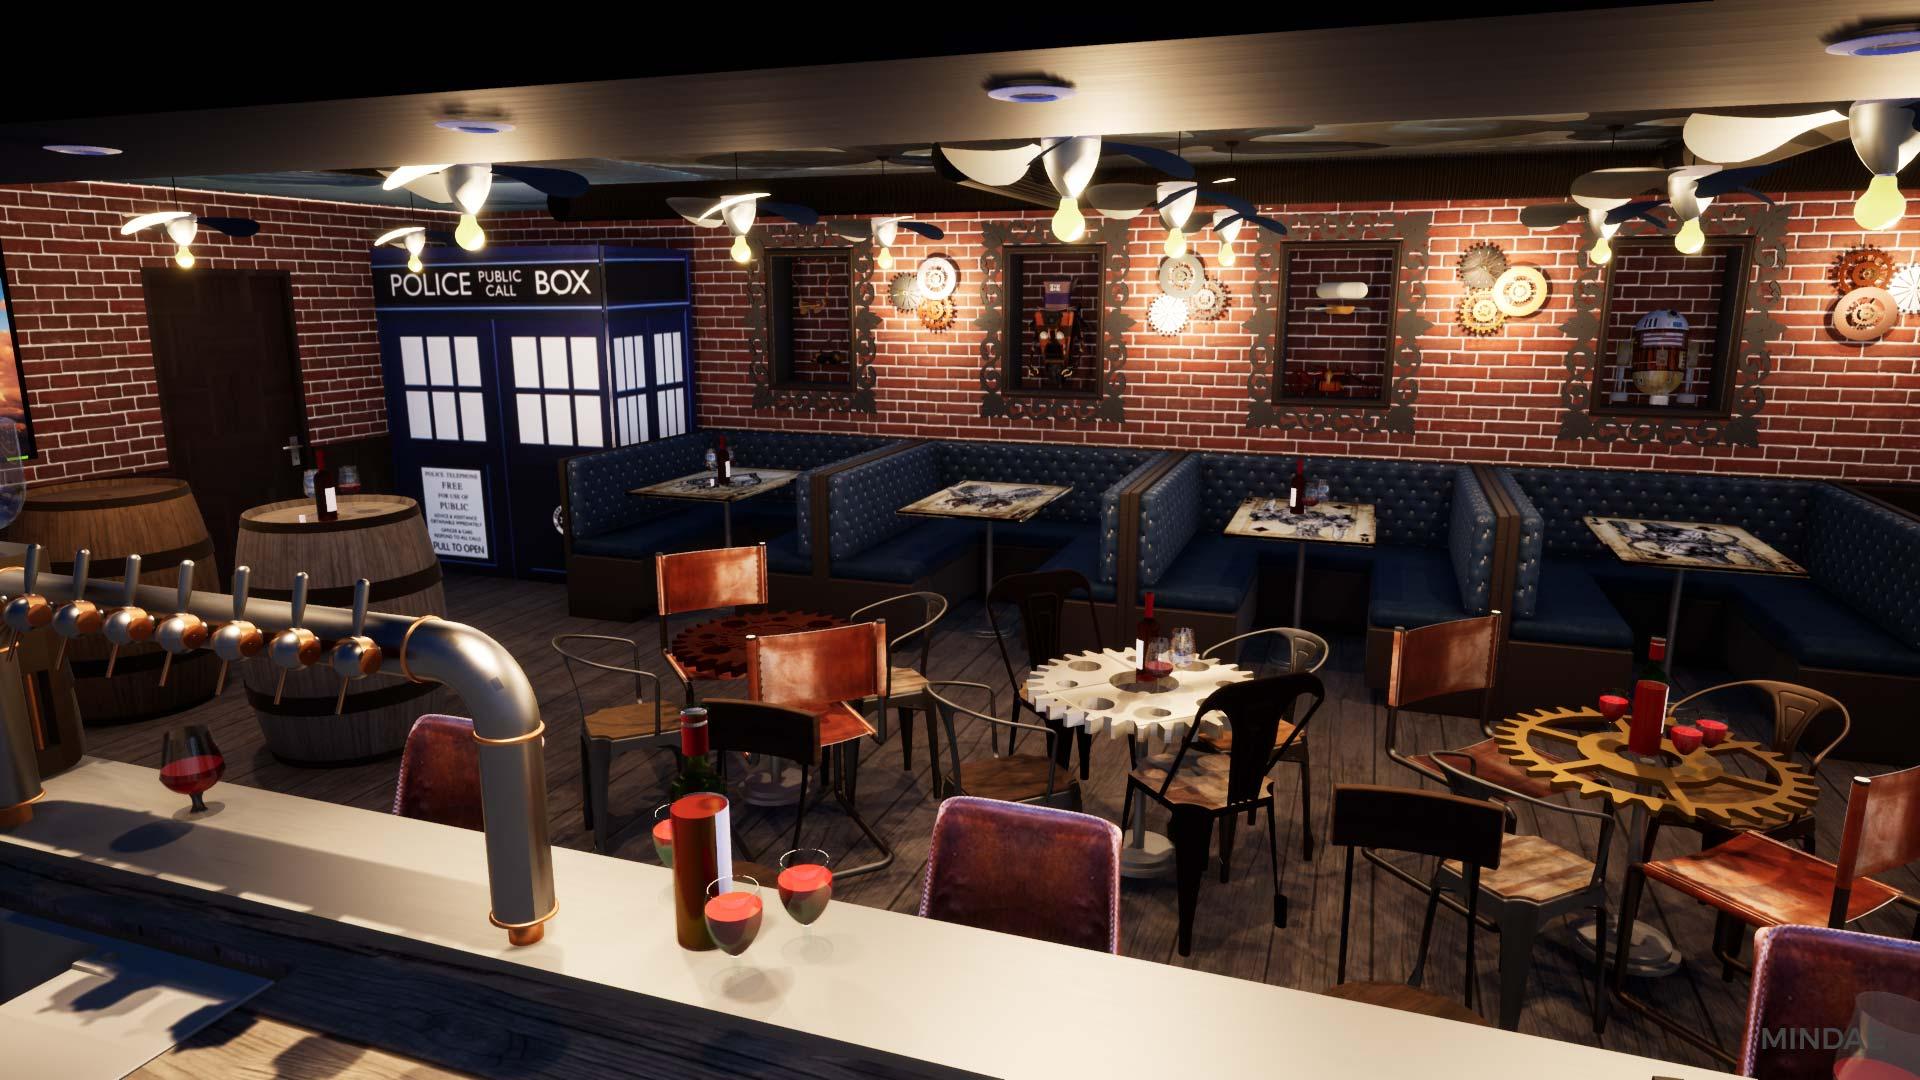 Mindae_3D_machiniste_bar_caen_steampunk_meca_agencement_comptoir_banquettes-(6)